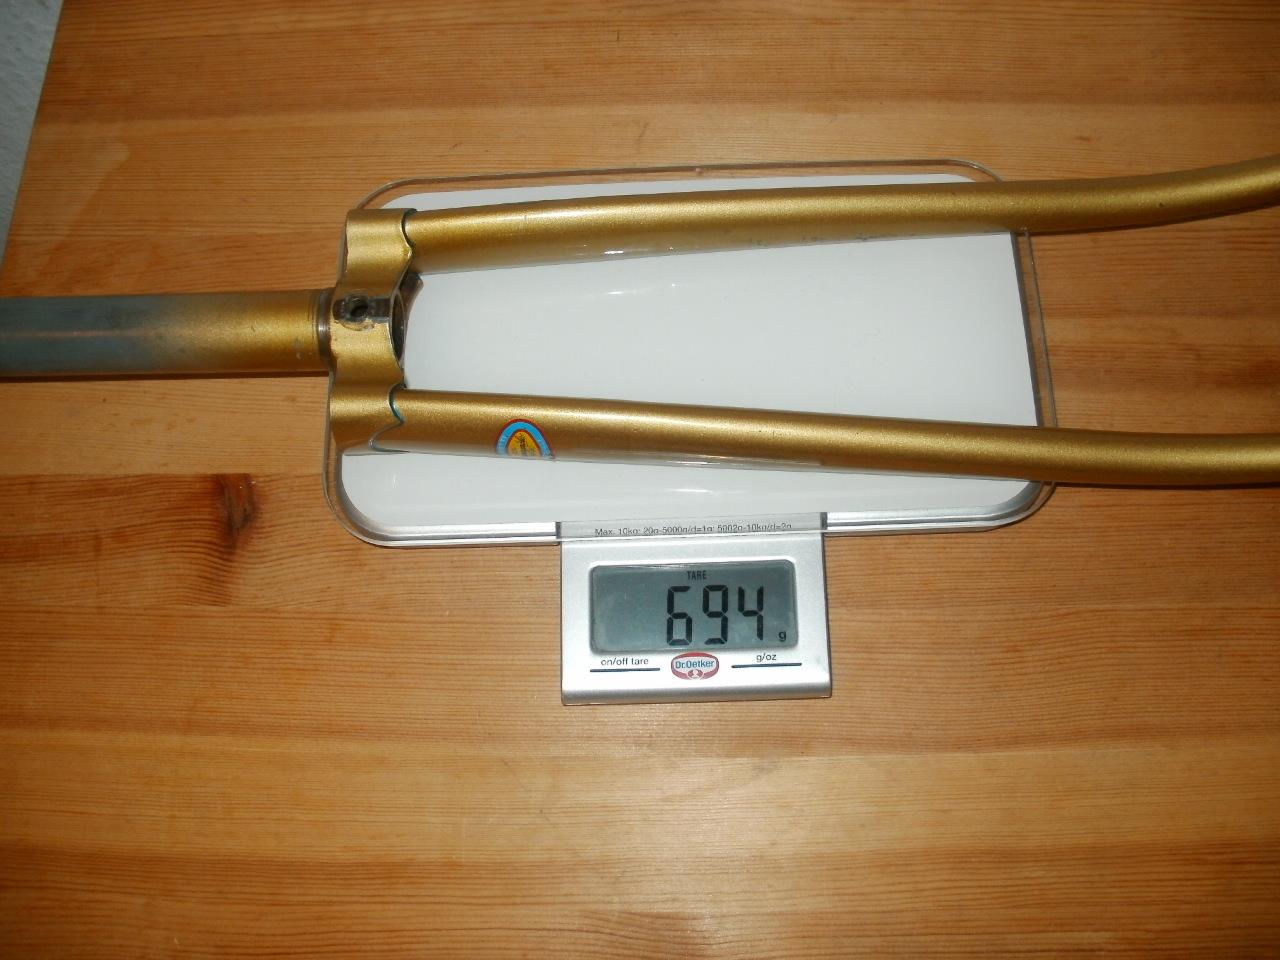 P1014960.JPG